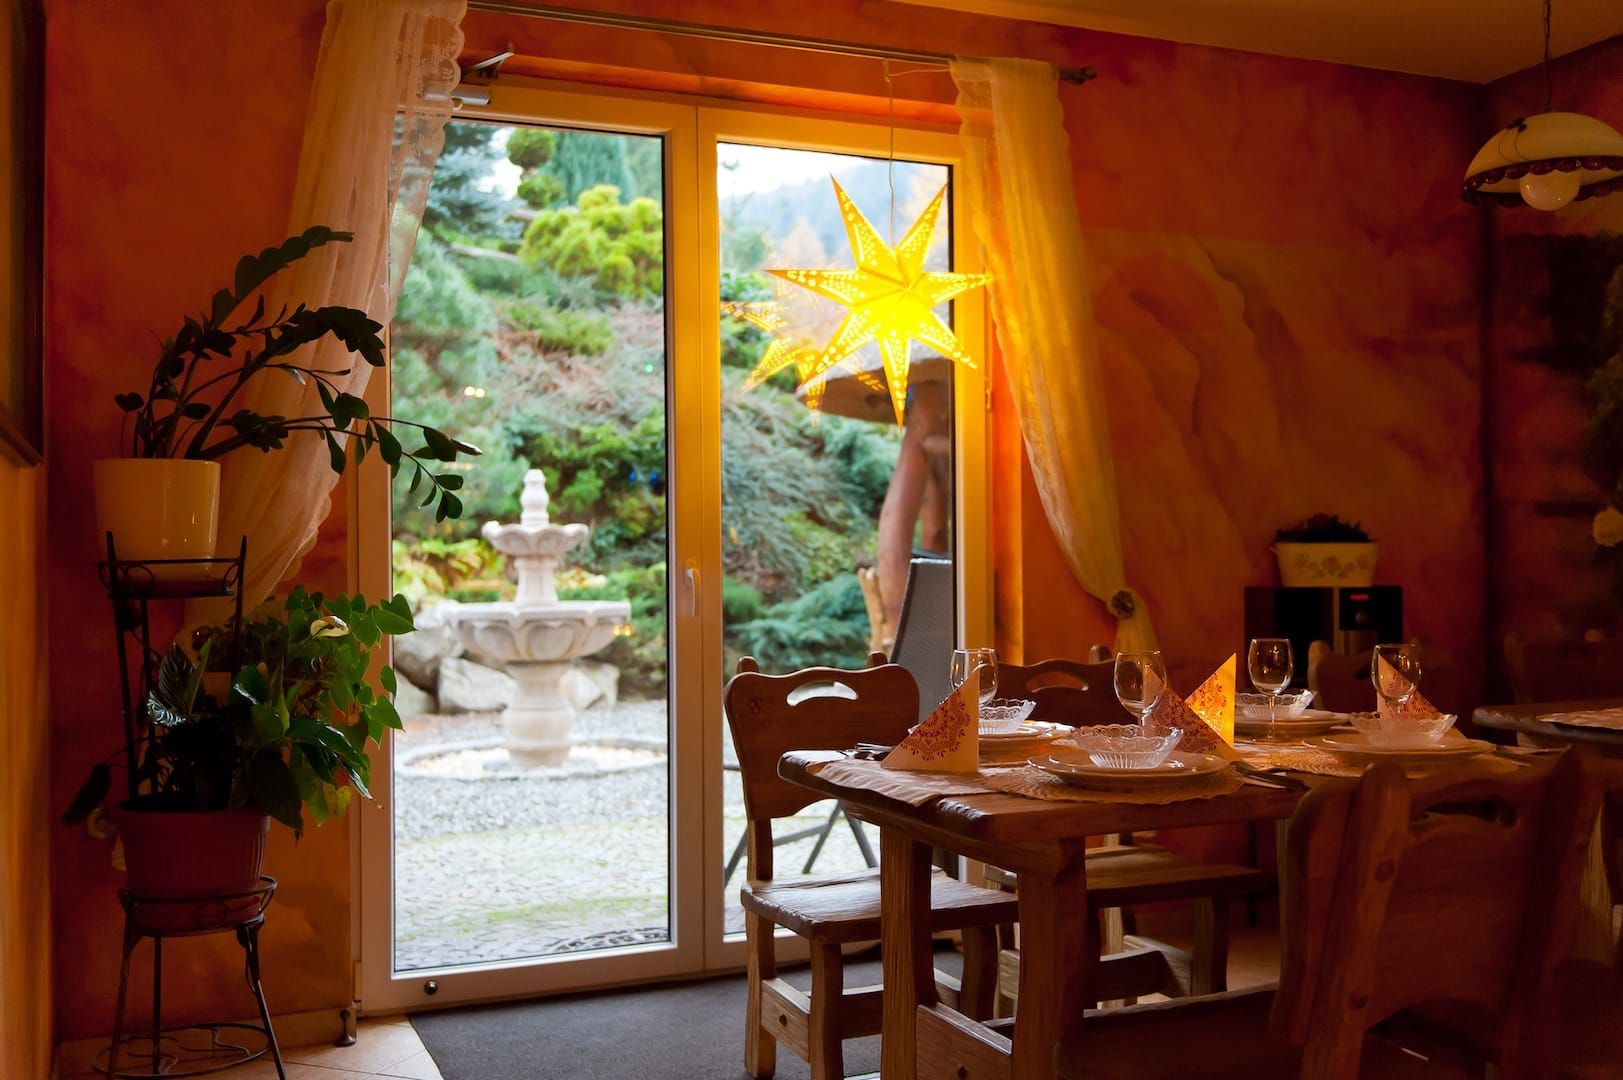 Zdjęcie kuchni oraz jadalni